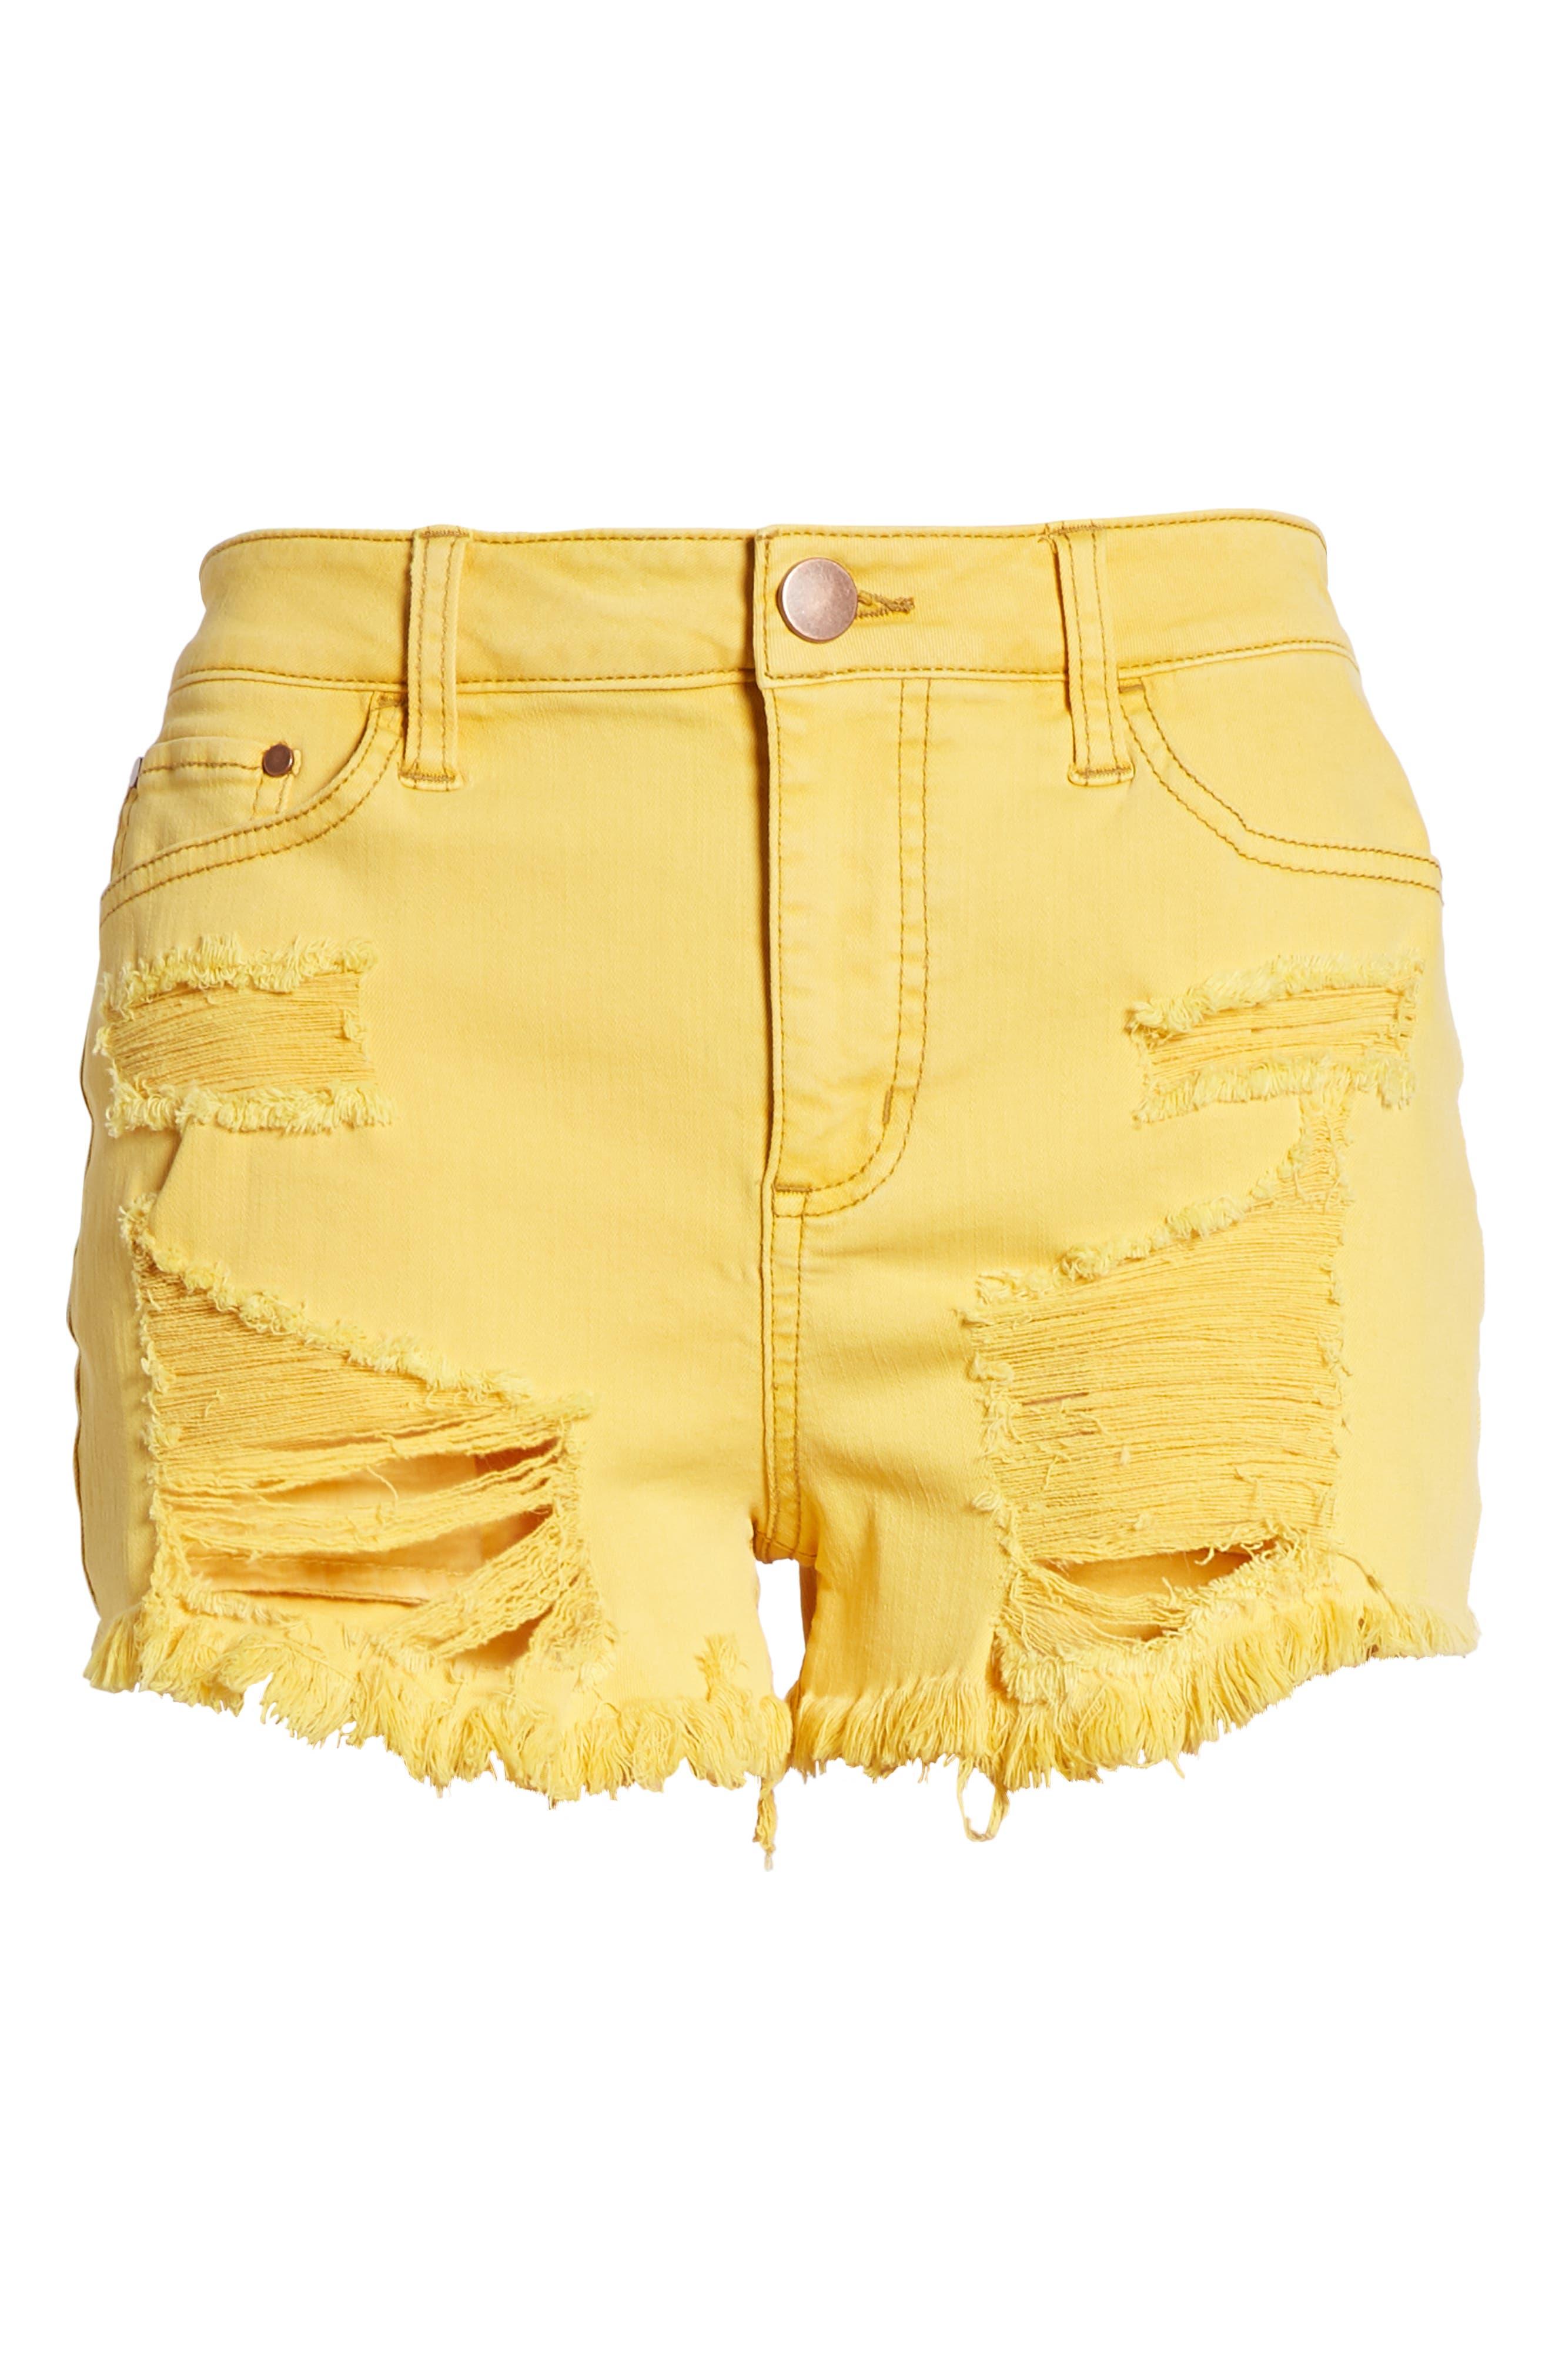 Decon Ripped Denim Shorts,                             Alternate thumbnail 7, color,                             701